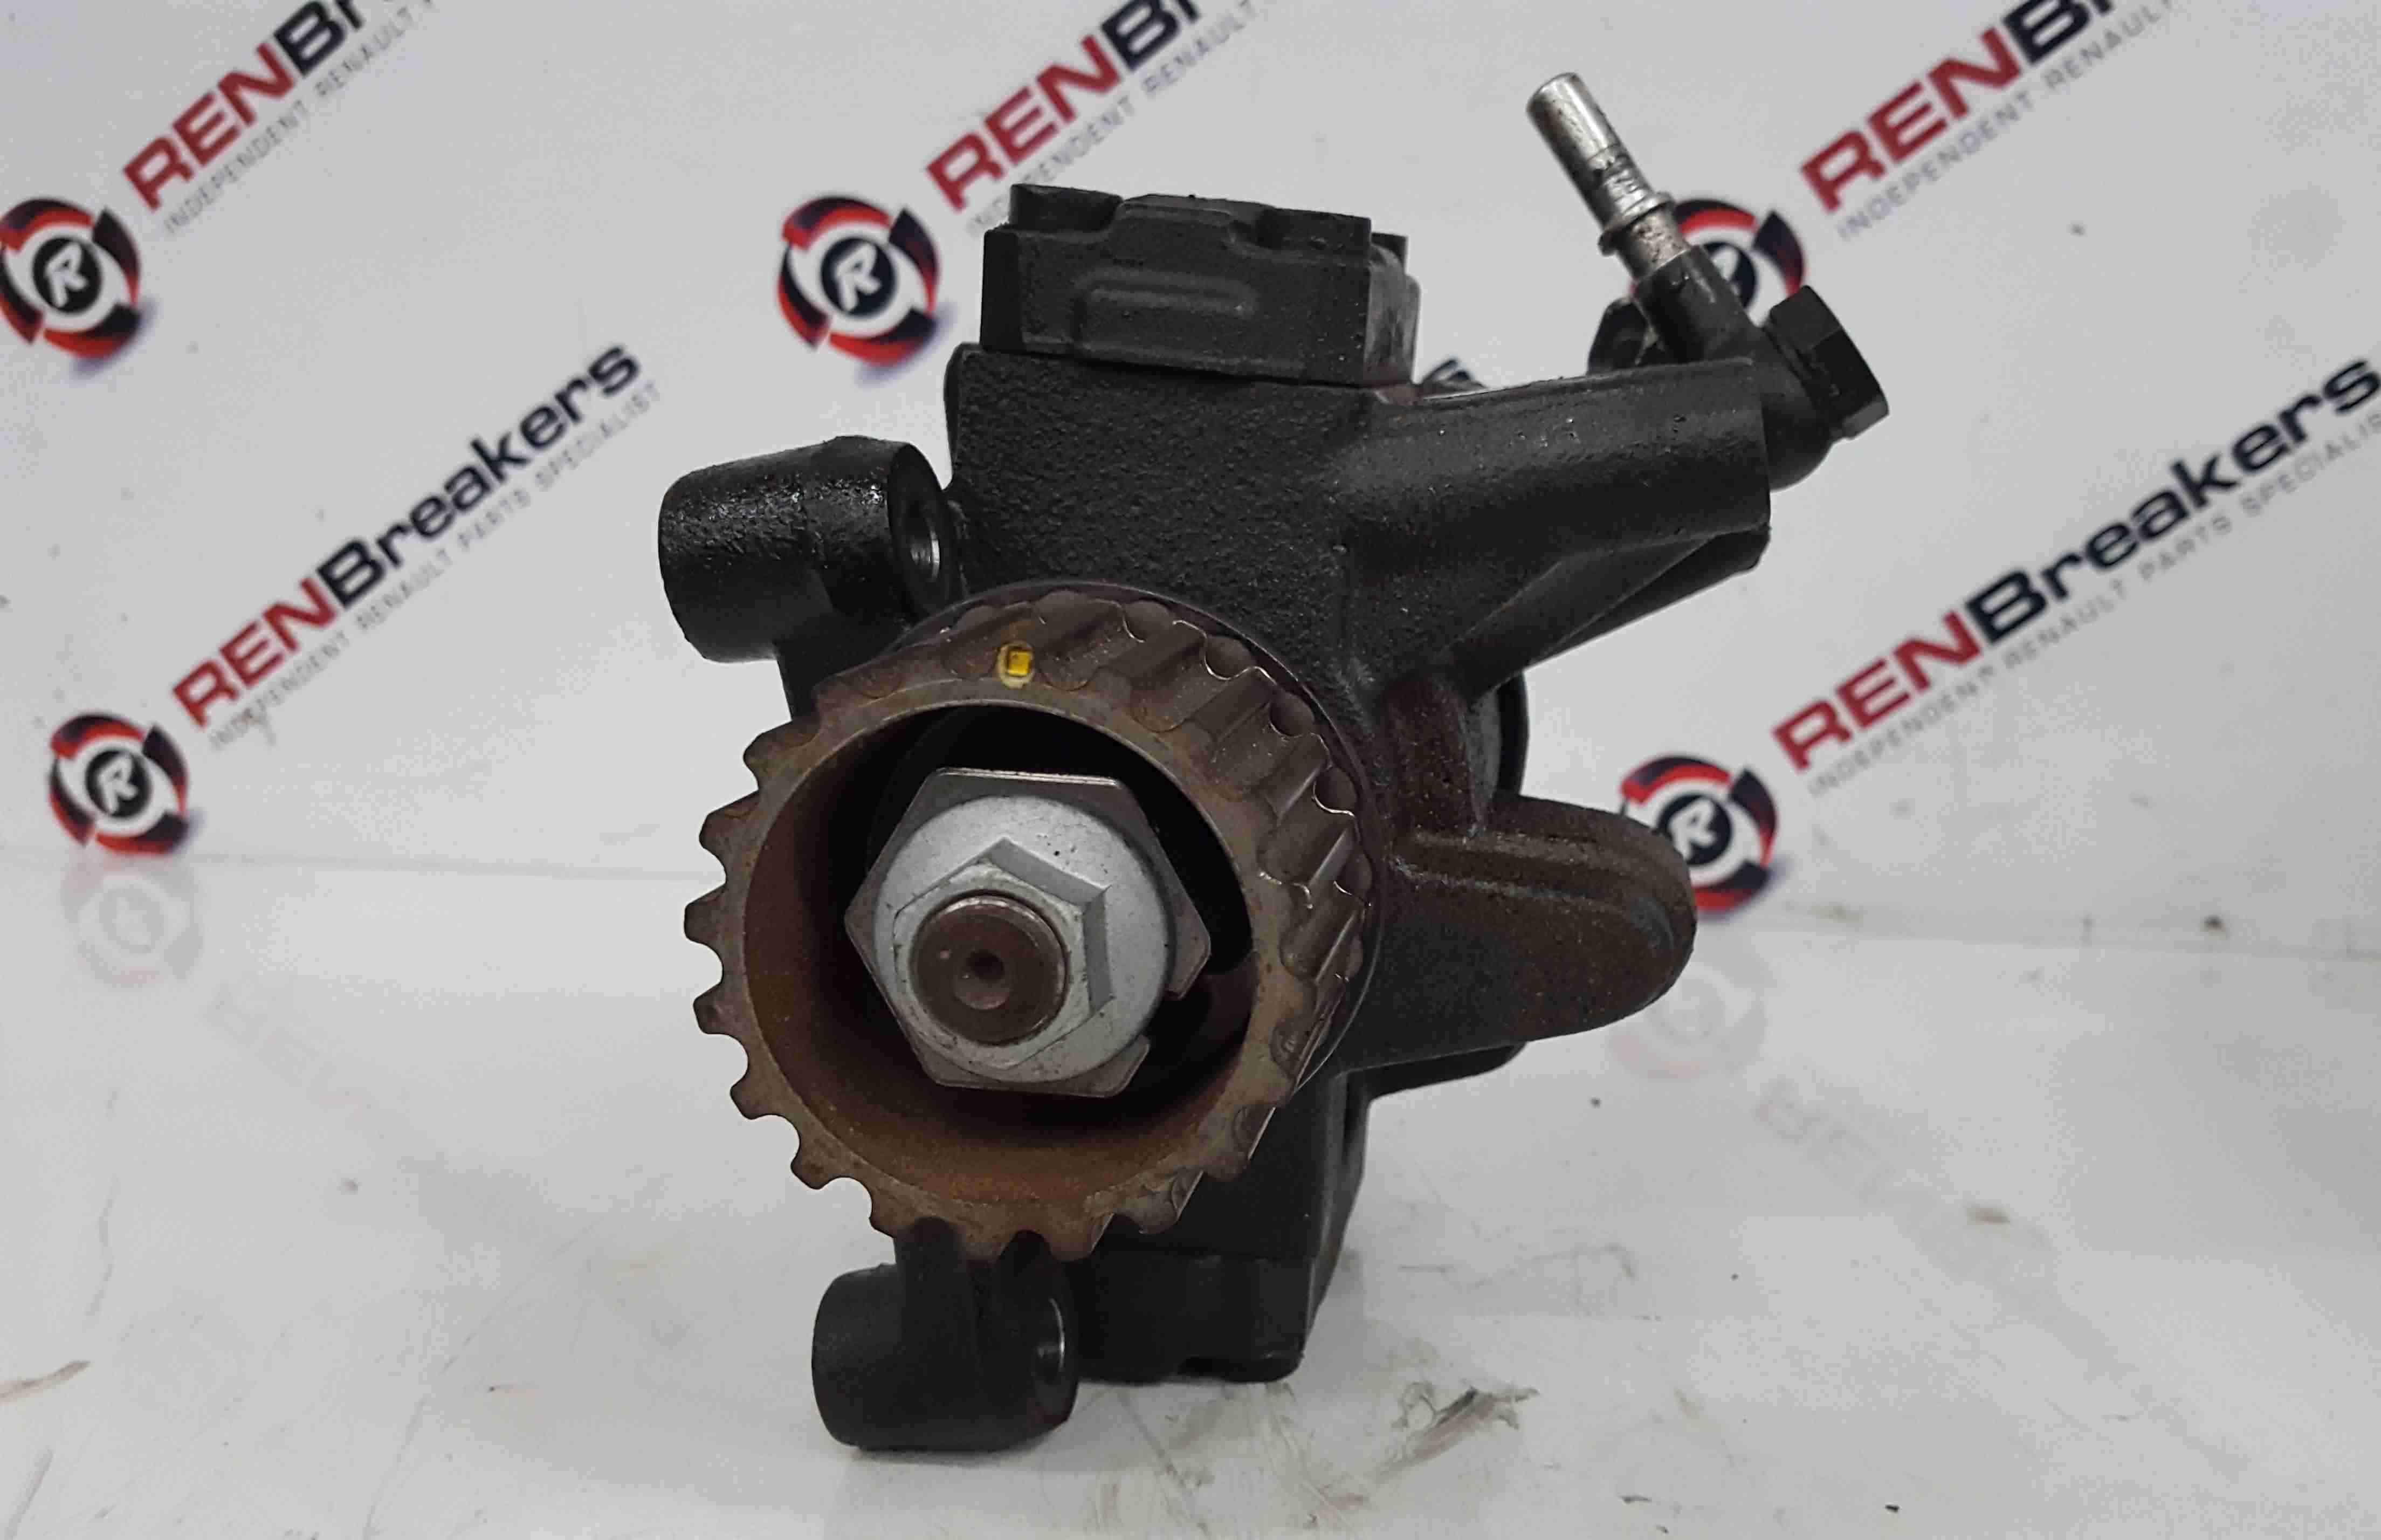 Renault Nissan Kadjar 2015-2021 1.5 DCi Diesel Injection Fuel Pump K9K